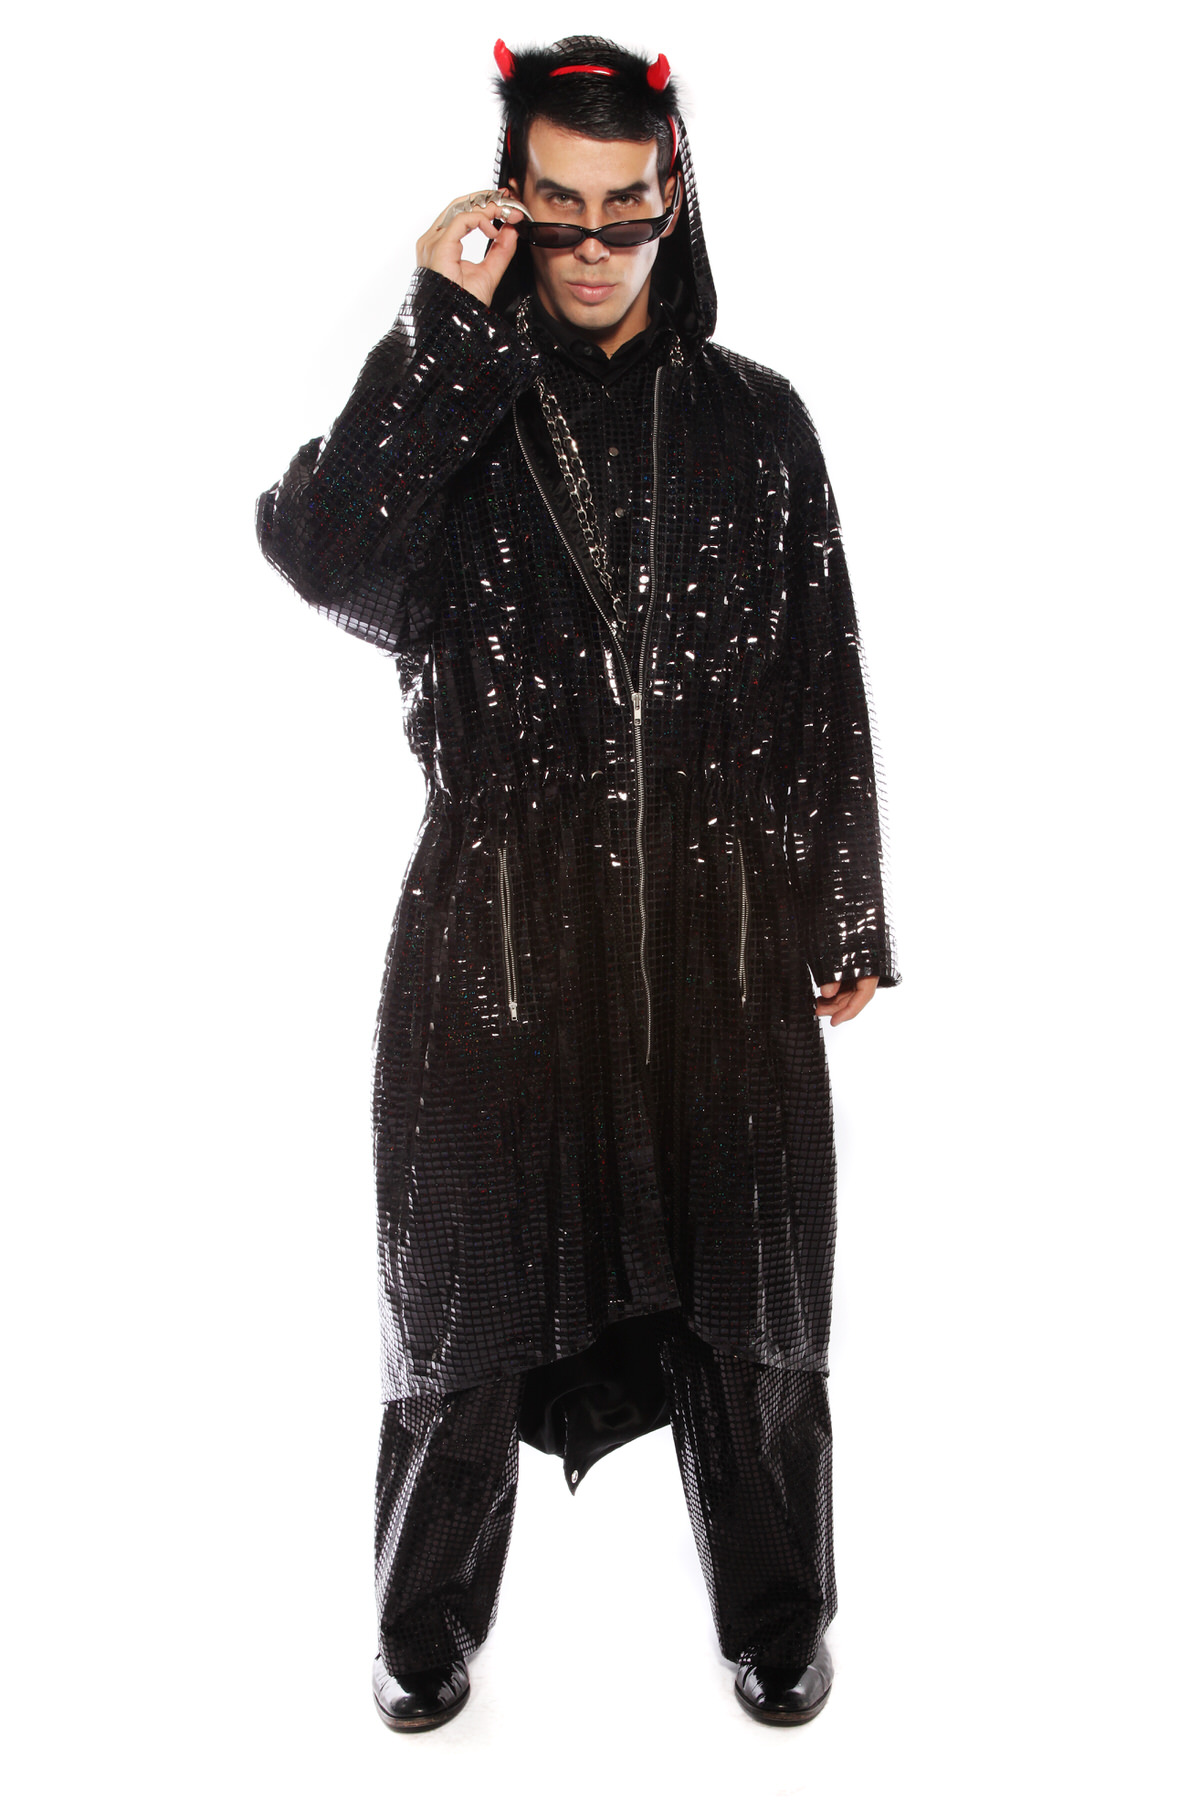 MATRIX DEVIL LONG BLACK SEQUIN COAT AND TROUSERS